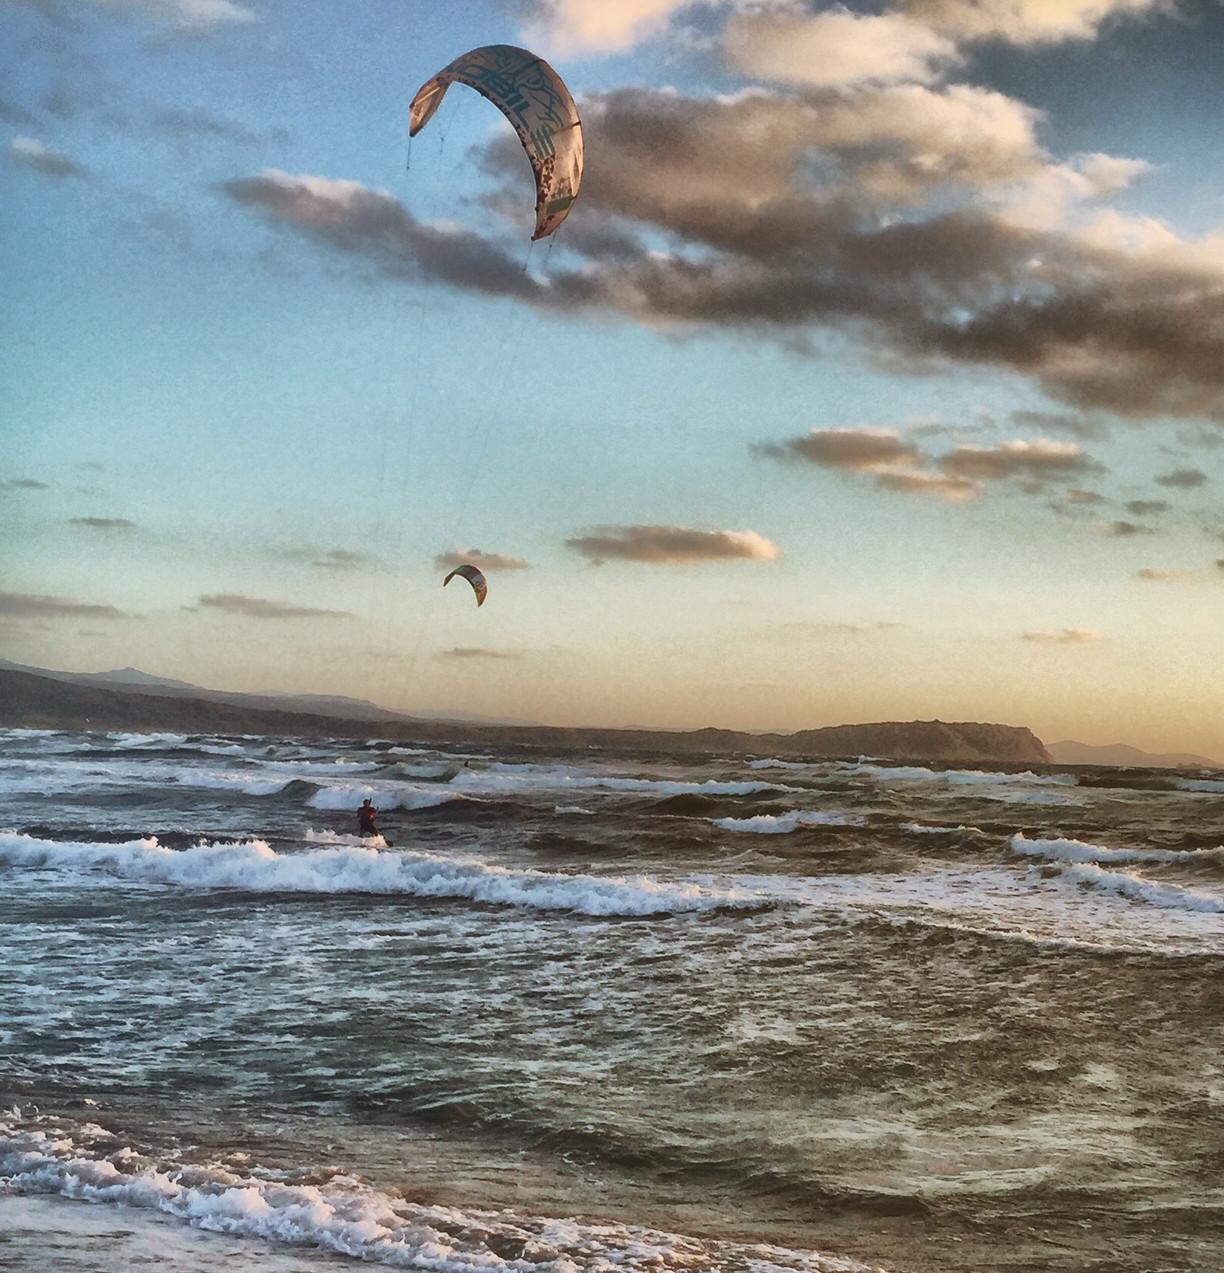 Kitesurfing at Rena Majore